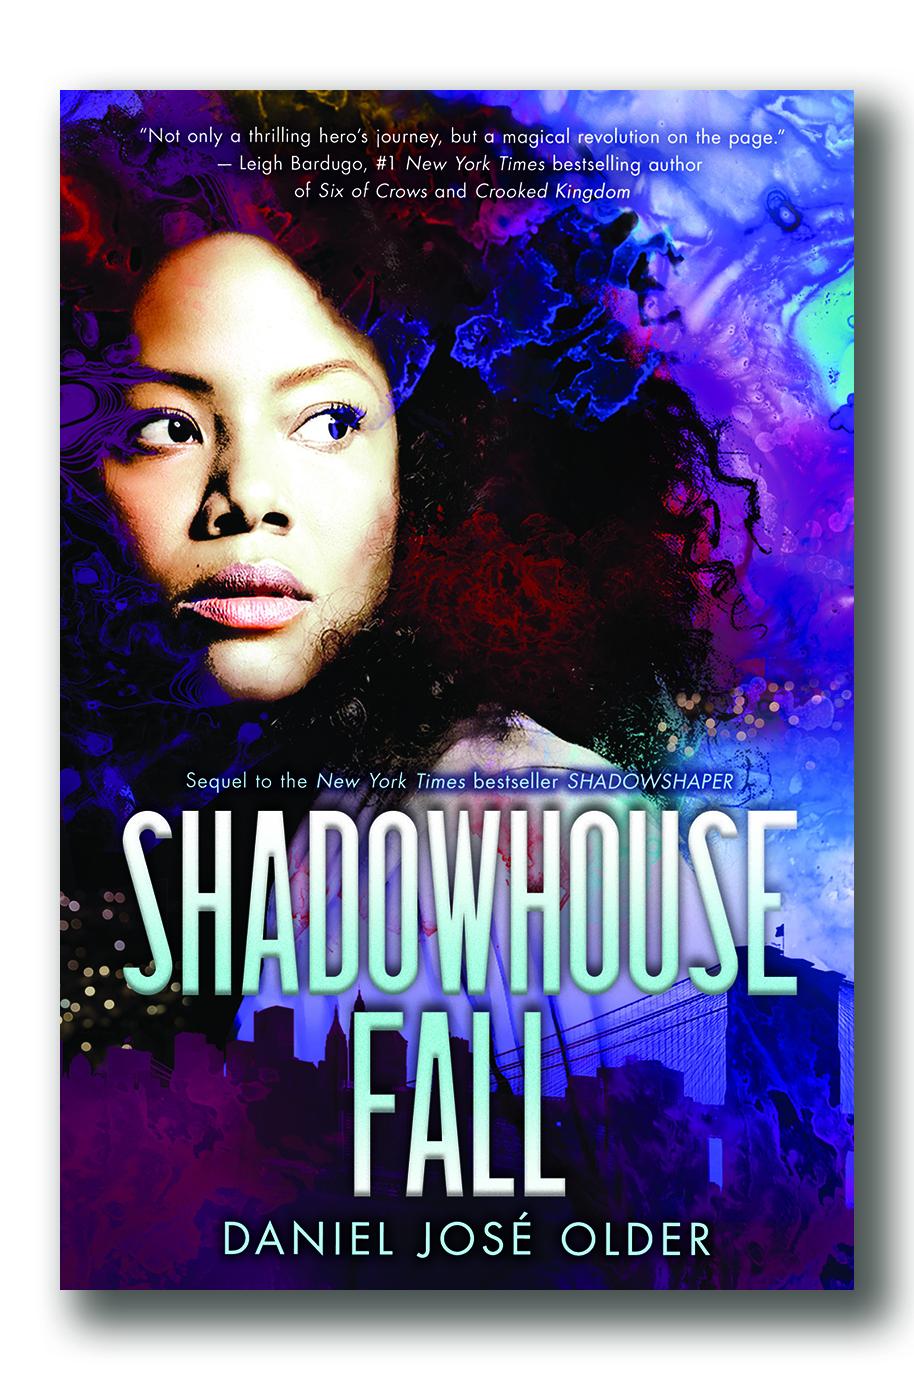 Shadowhouse Fall.jpg